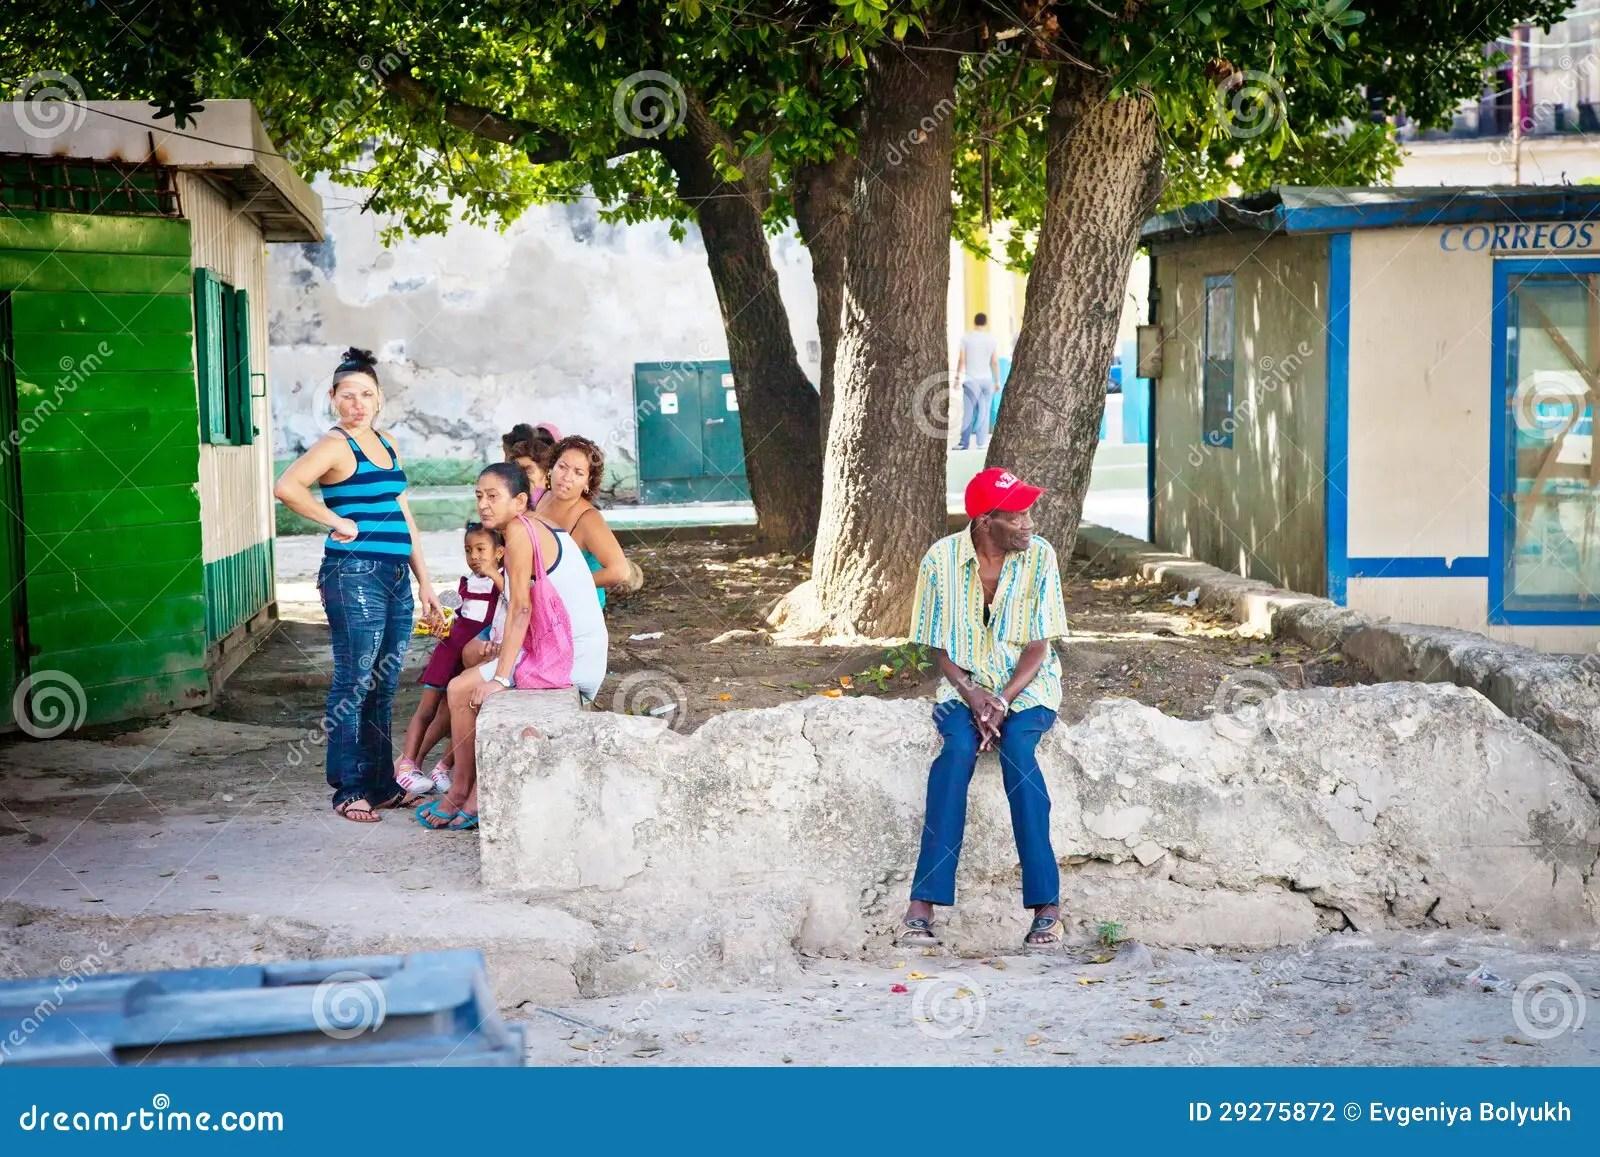 Cuban Native People On Streets Of Havana Editorial